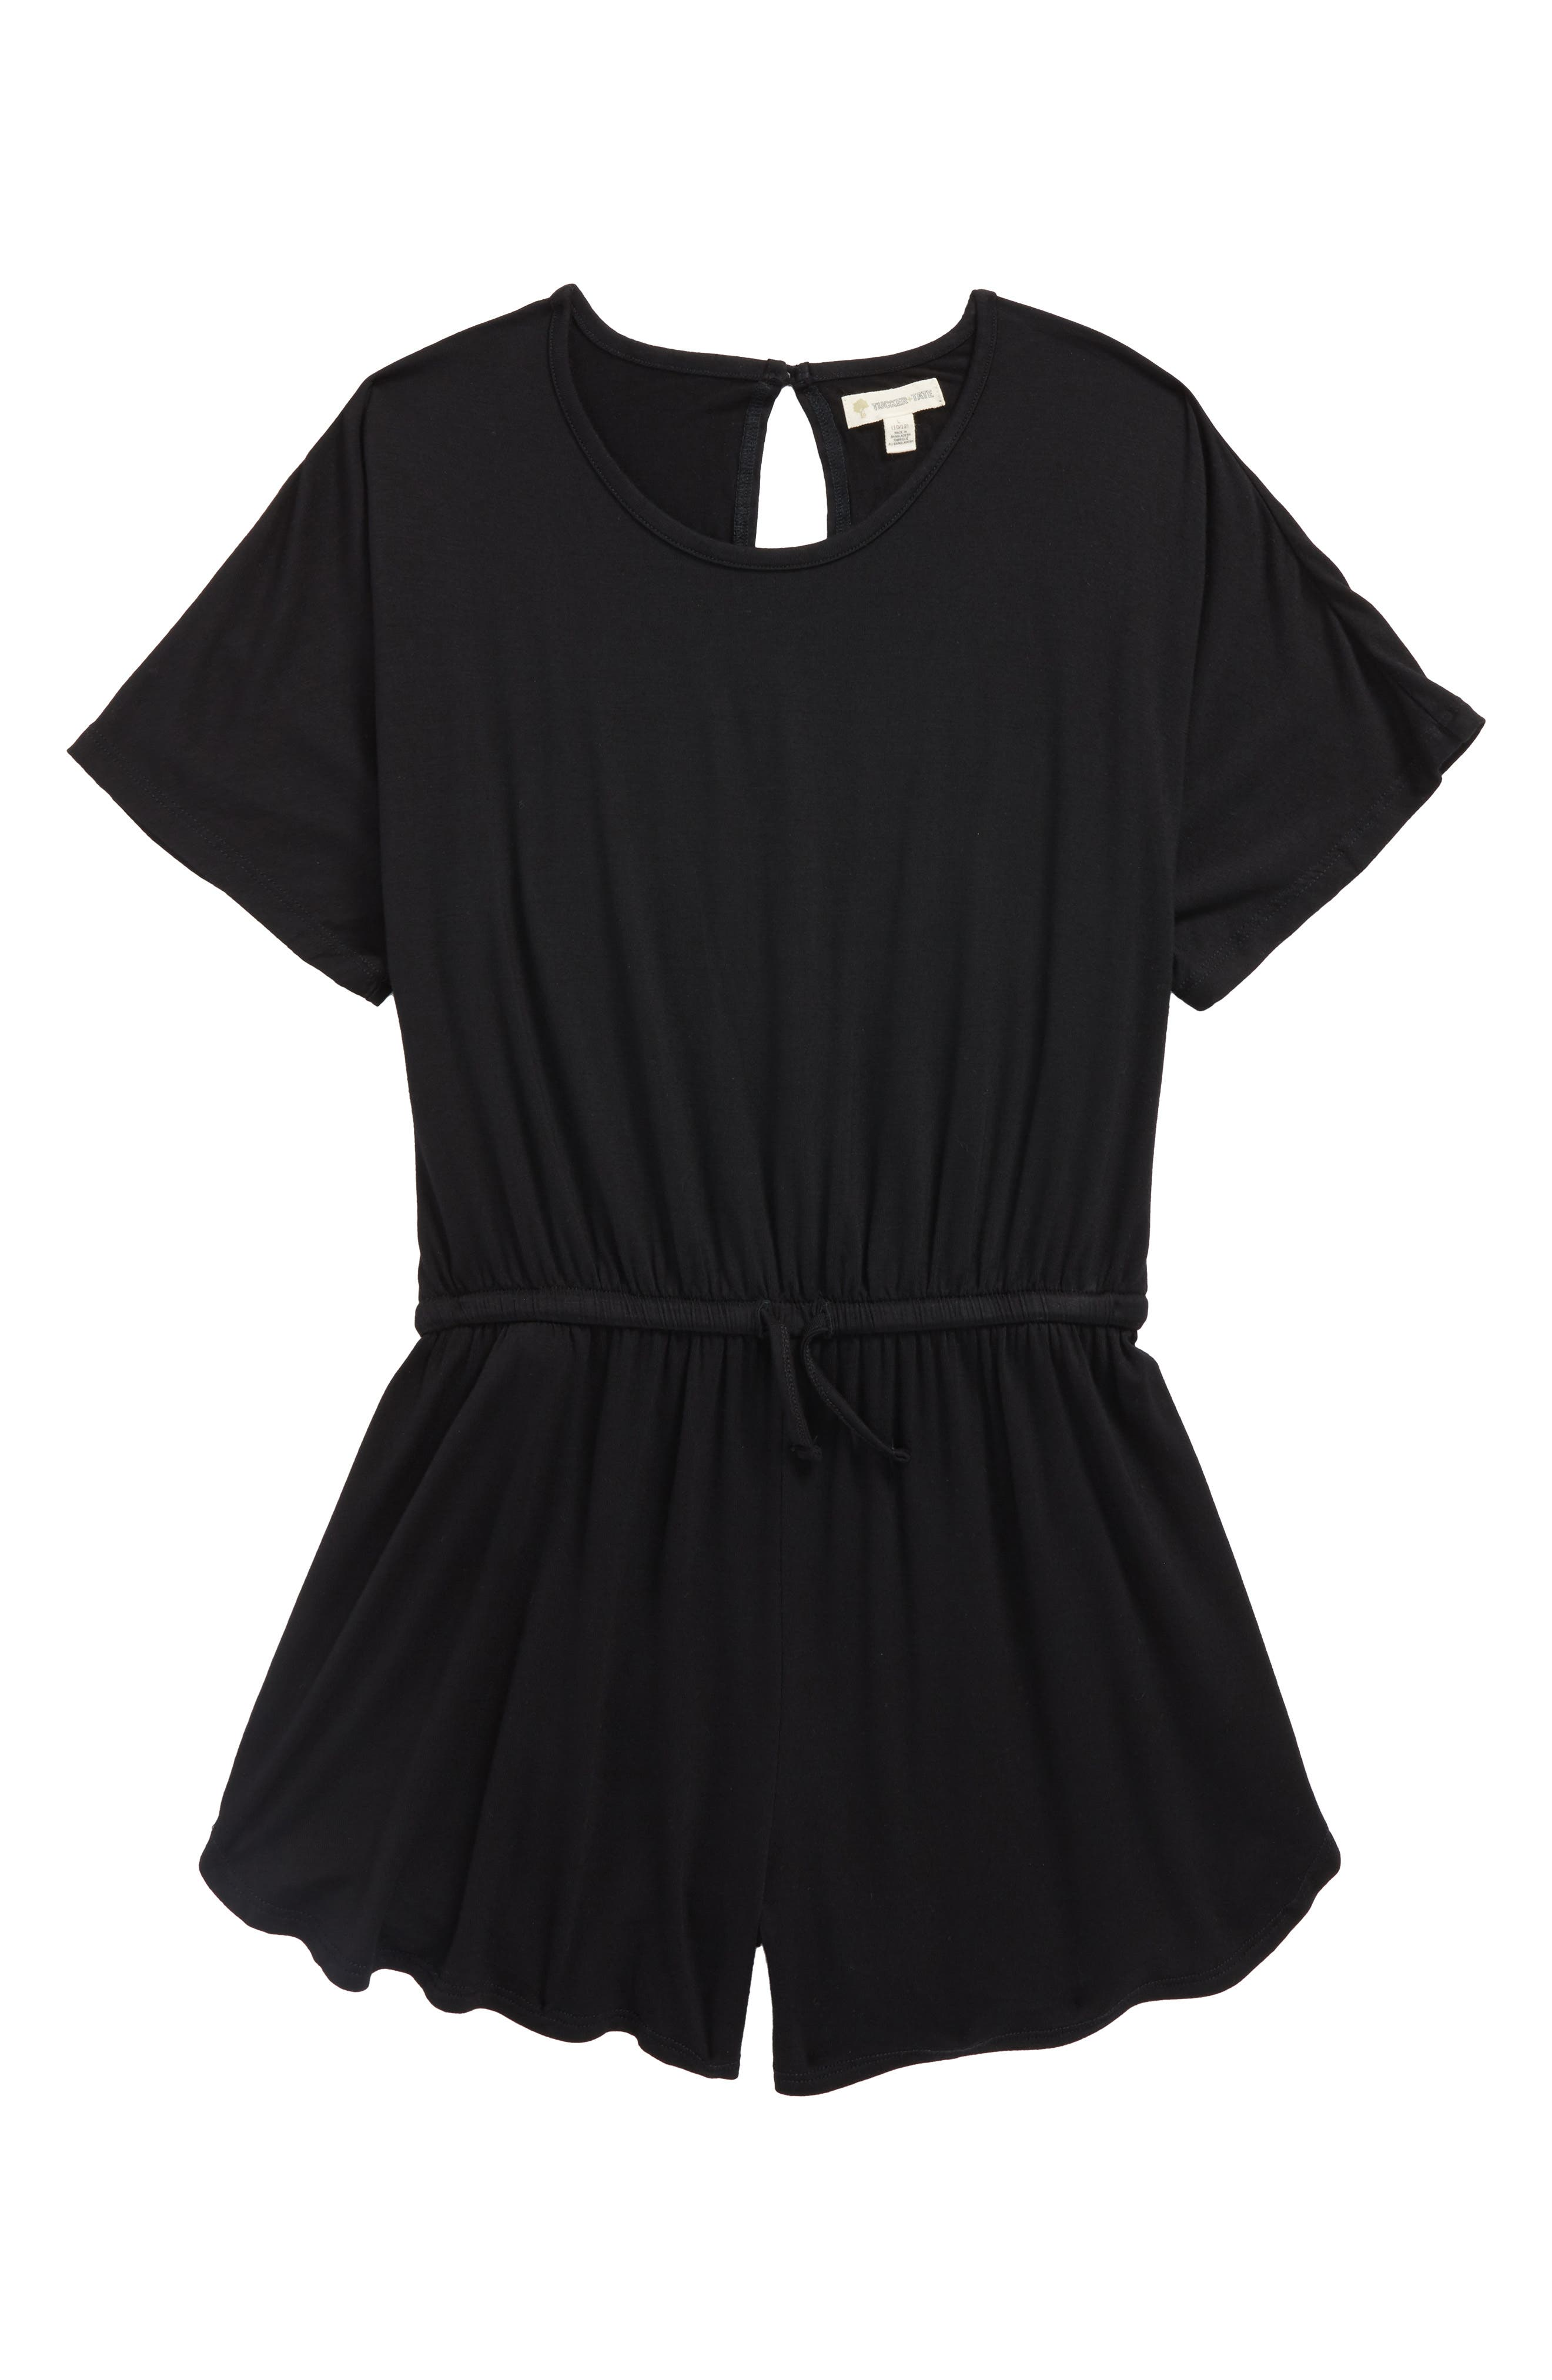 TUCKER + TATE Knit Romper, Main, color, BLACK